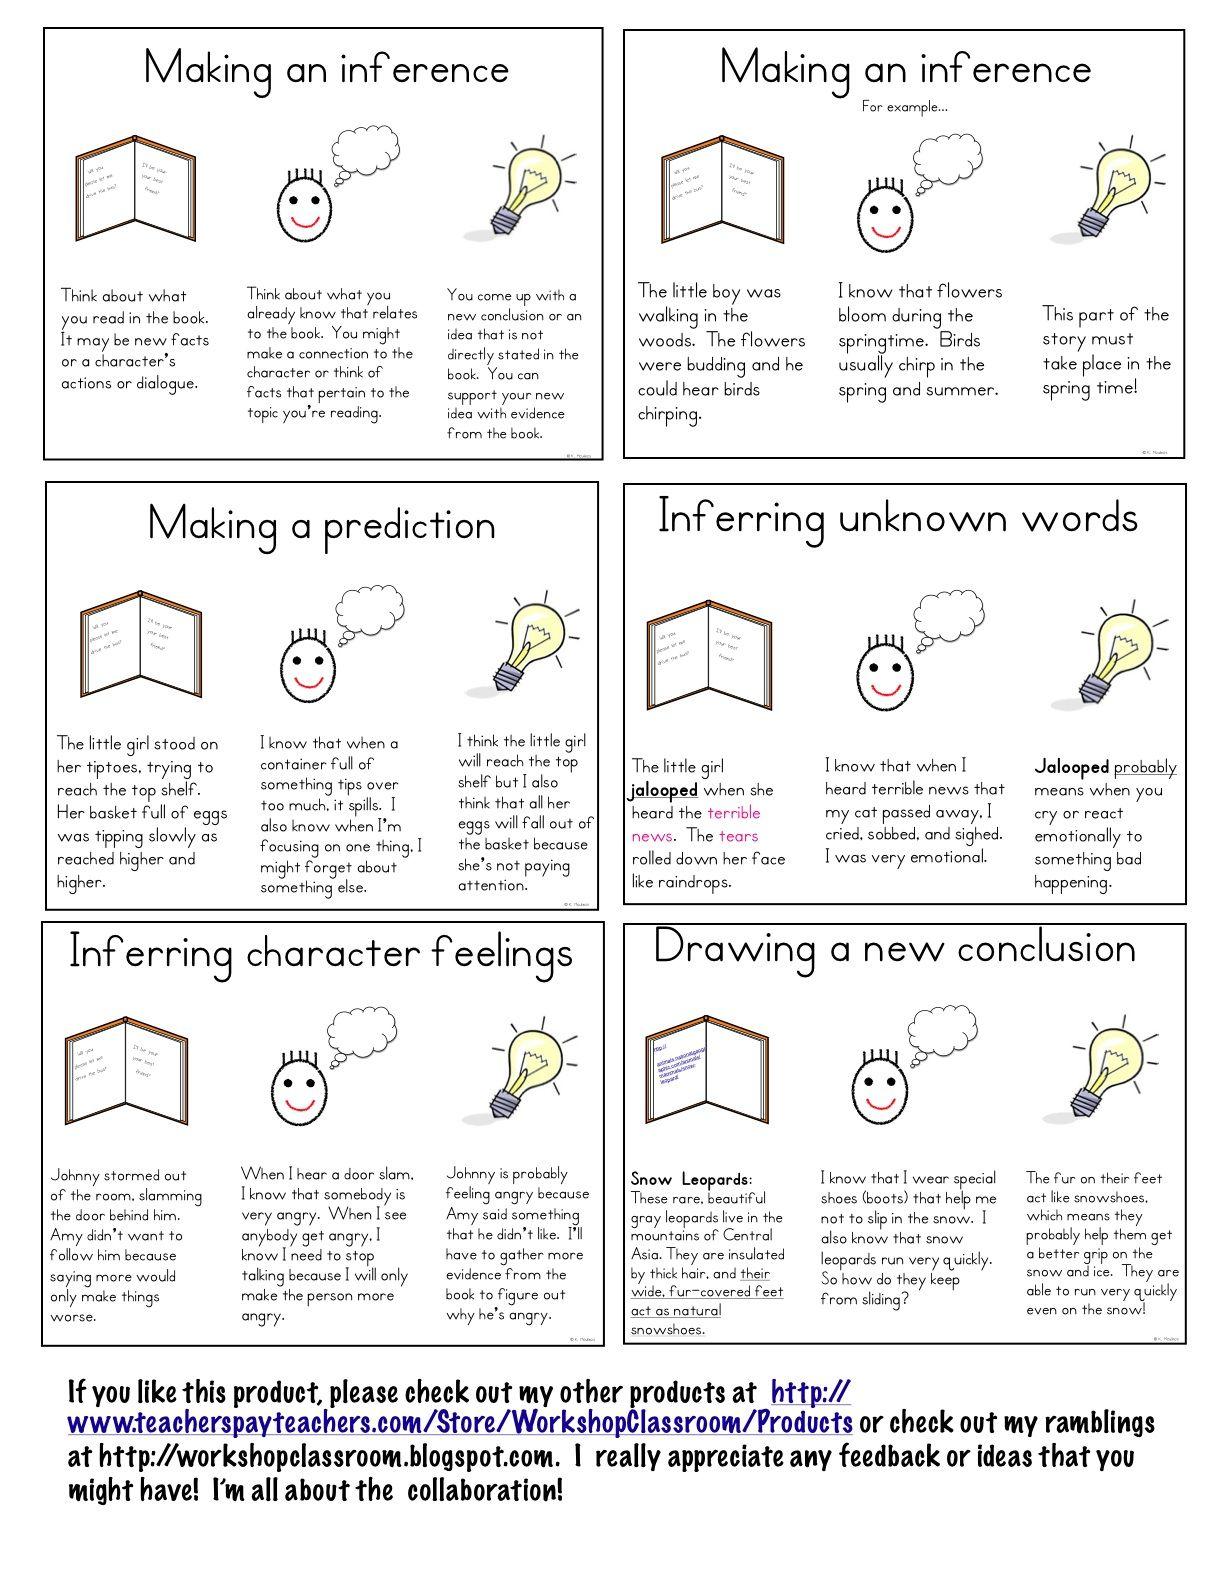 Workshop Classroom Making Inferences